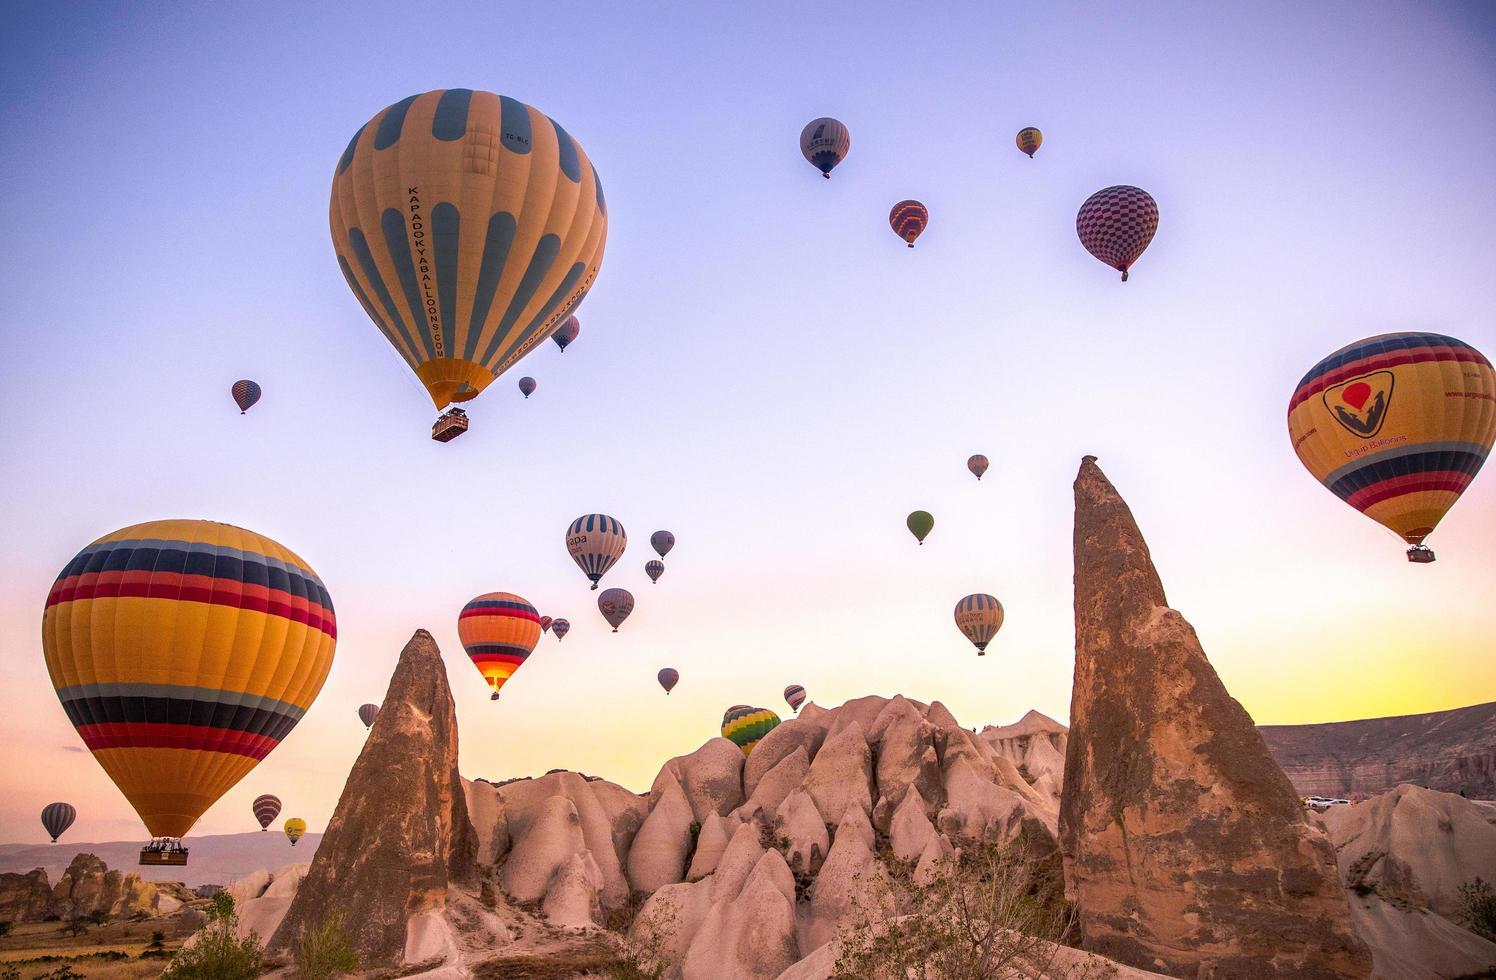 Hot air balloons at sunset in Cappadocia, Turkey photo